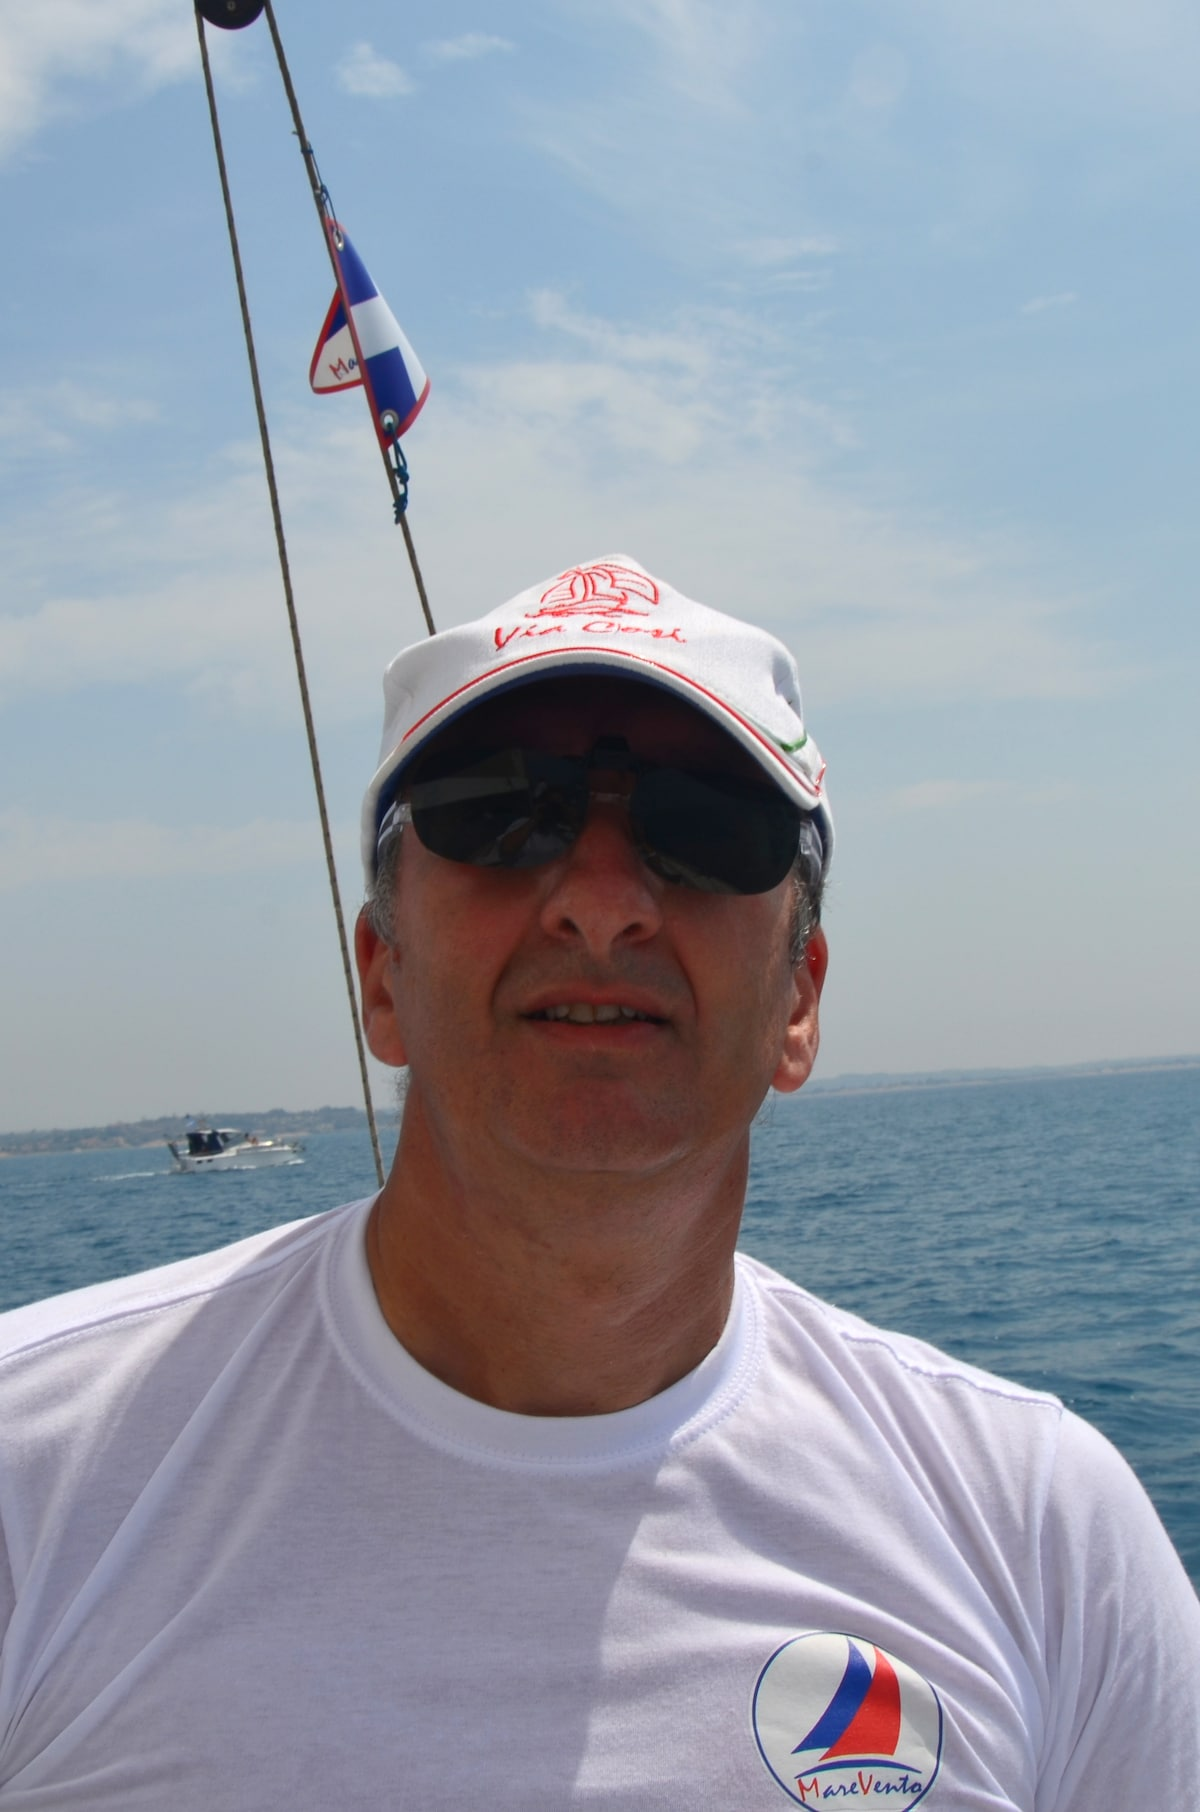 Luigi Giulio Omar Maria From Marina di Modica, Italy